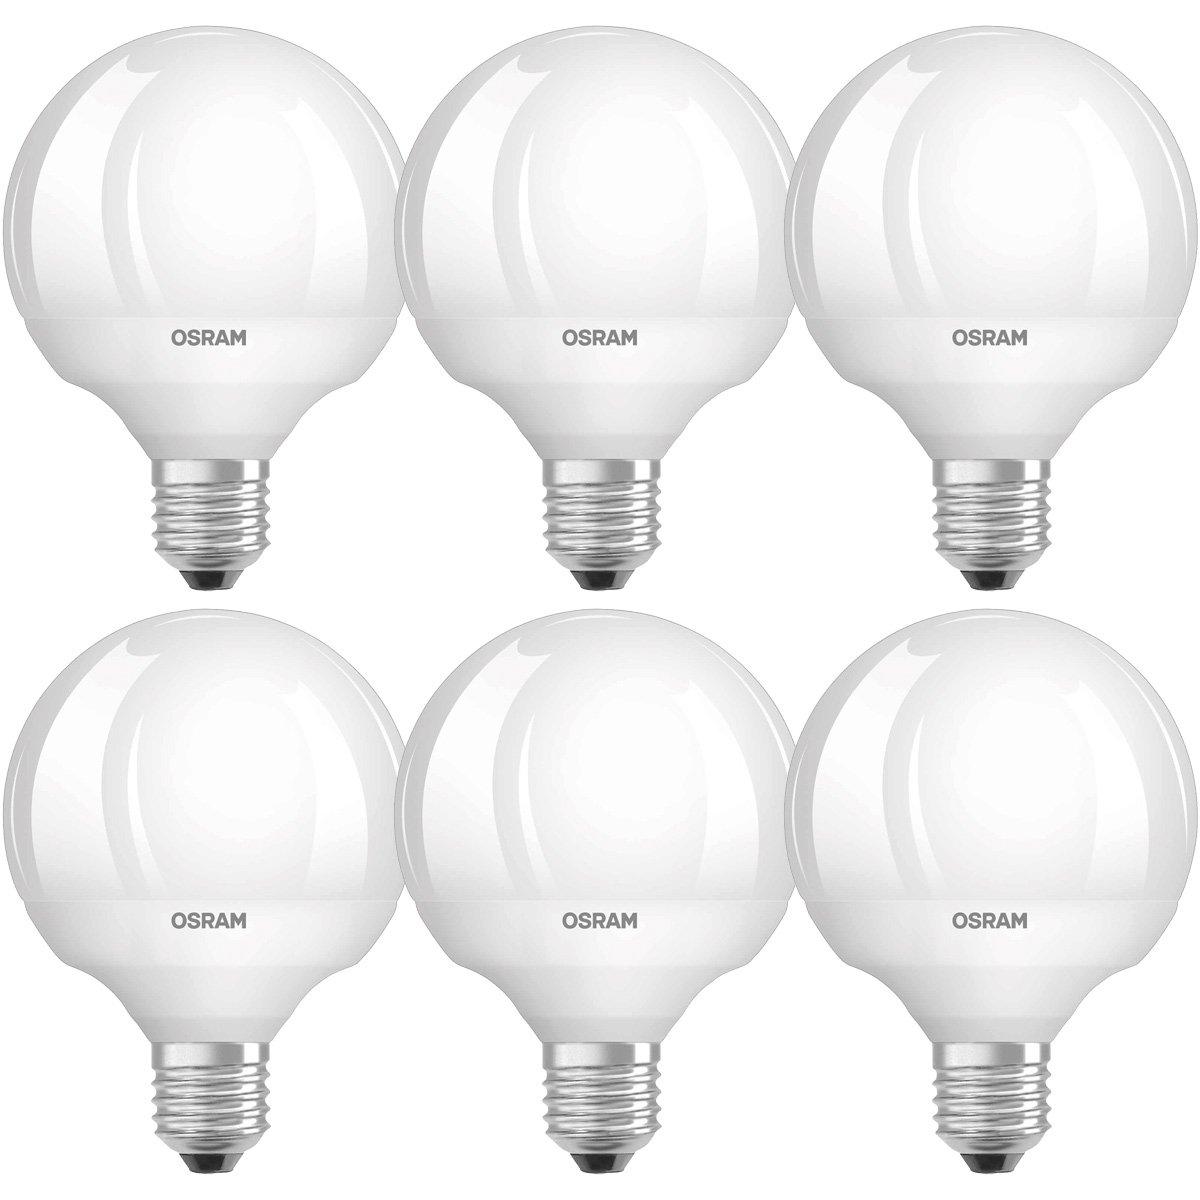 OSRAM LED Star Classic Globe/LED-Lampe in Ballform mit E27-Sockel ...